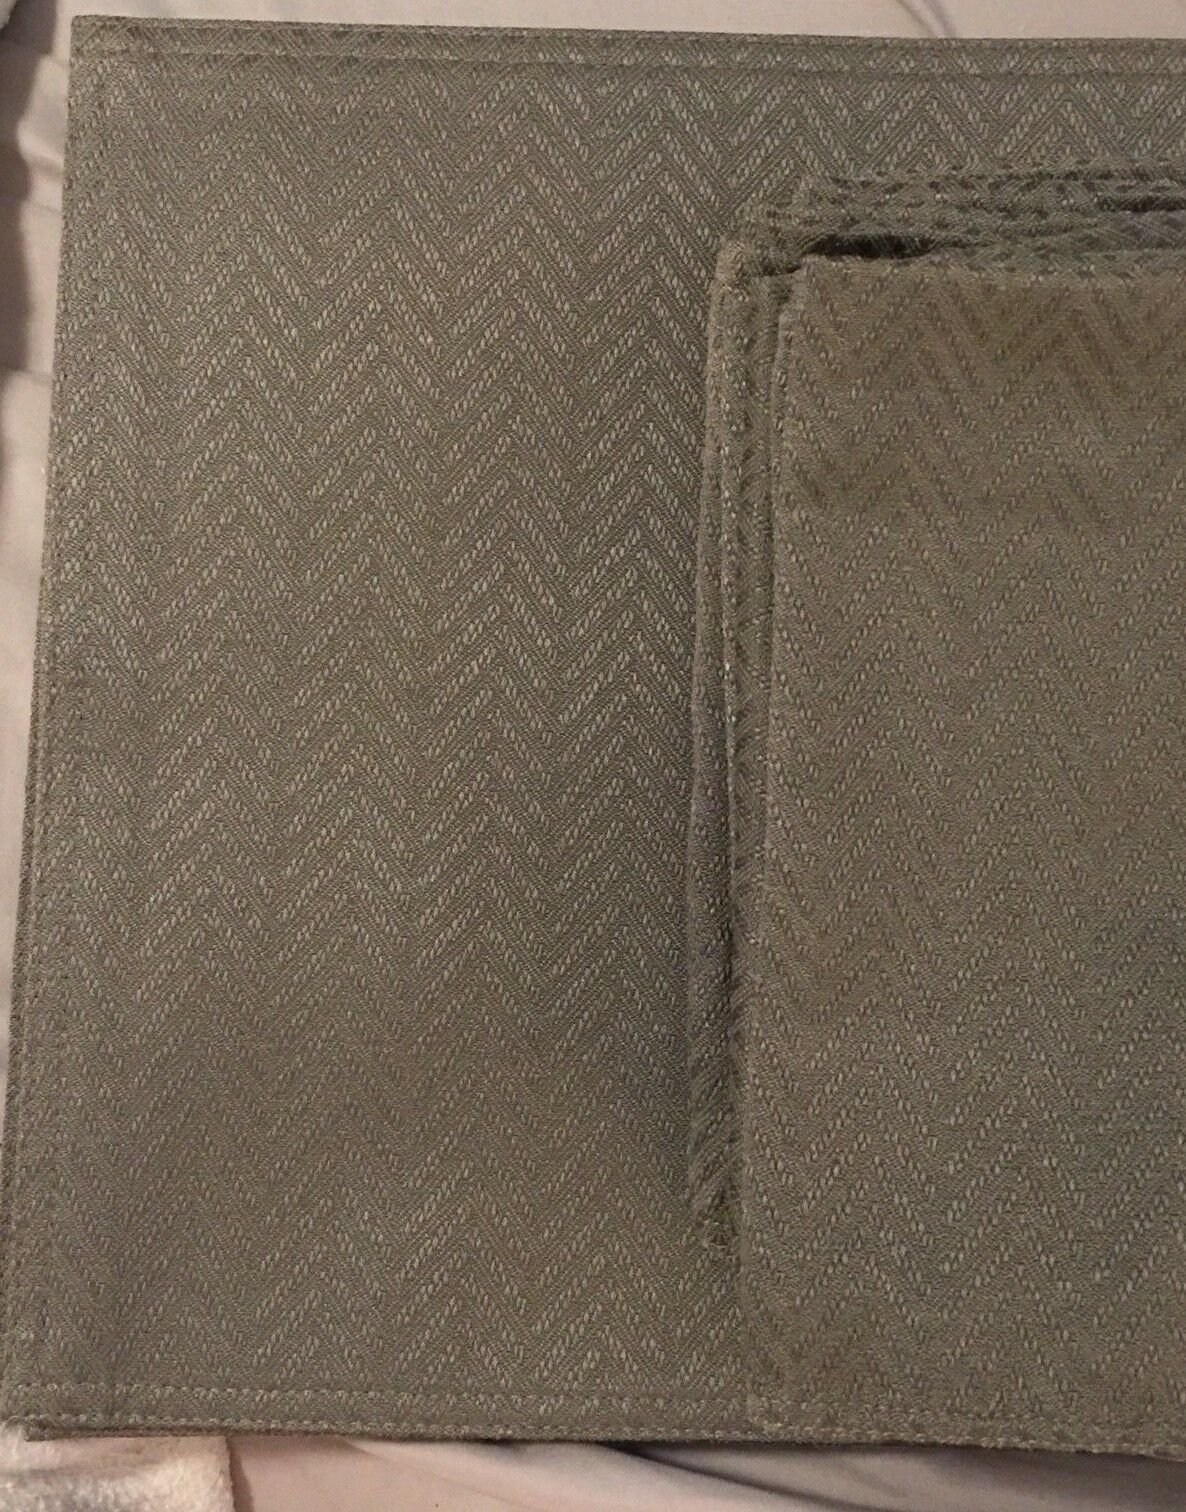 Ralph Lauren Napkin Placemat Set of 6 Olive vert Chevron Pattern Table Linen